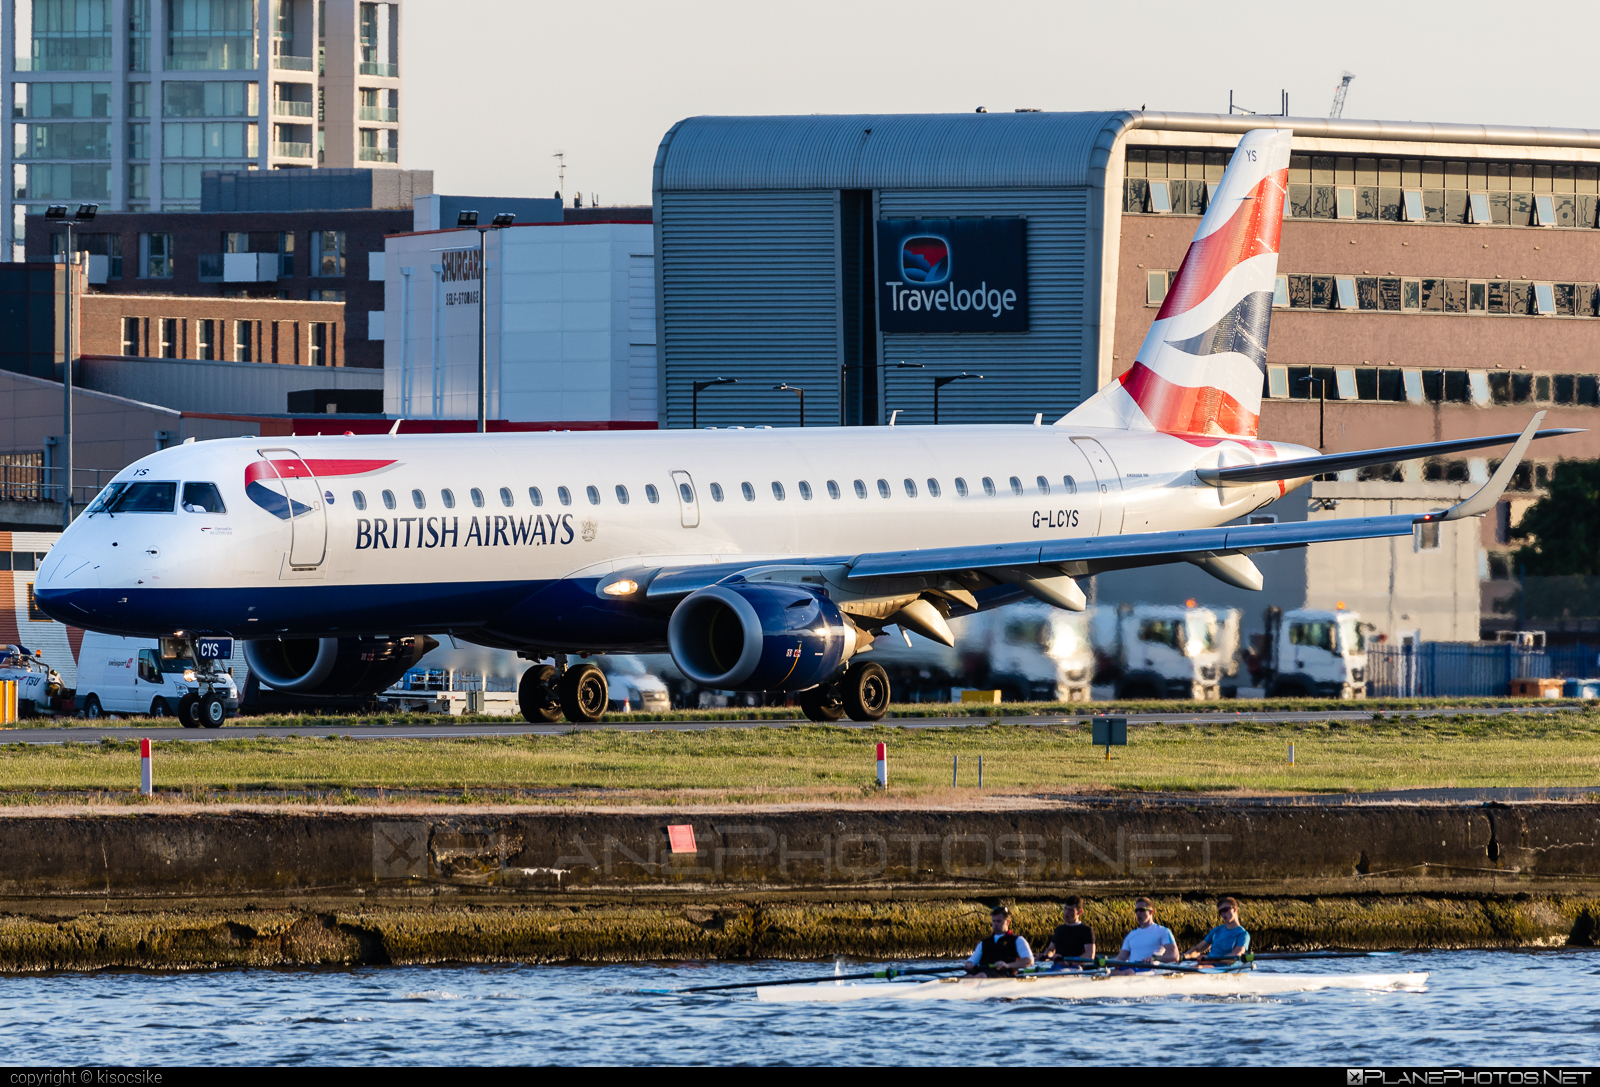 Embraer E190SR (ERJ-190-100SR) - G-LCYS operated by BA CityFlyer #e190 #e190100 #e190100sr #e190sr #embraer #embraer190 #embraer190100sr #embraer190sr